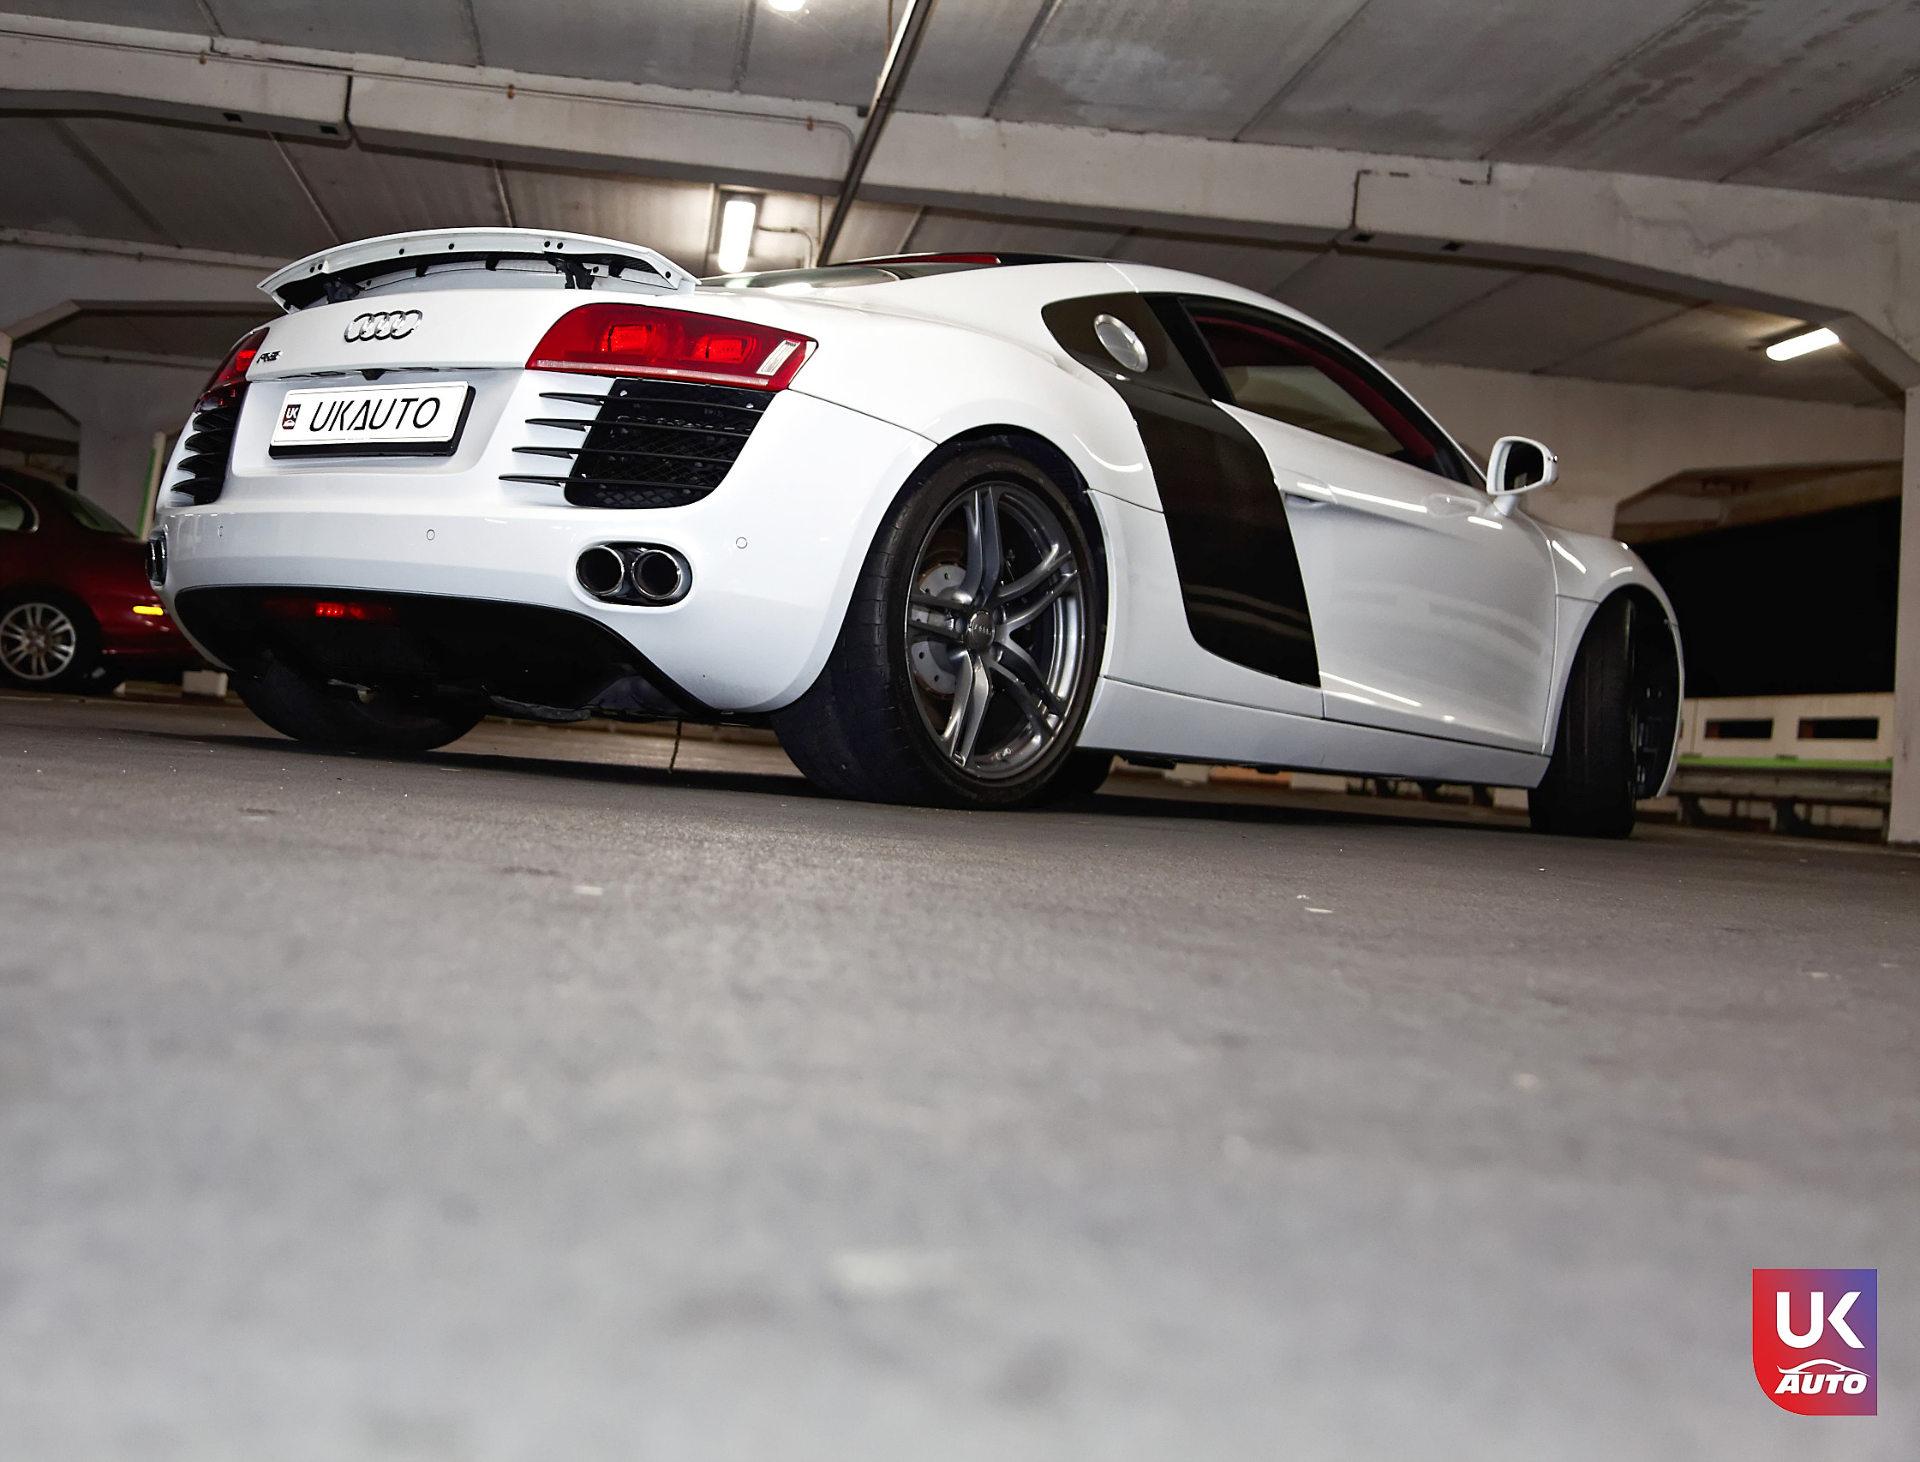 Audi R8 Import audi r8 lhd angleterre audi R8 V8 TFSI AUDI uk importation audi LHD volant a gauche15 DxO - AUDI R8 ANGLETERRE IMPORTATION AUDI R8 UK IMPORT SUPERCAR FELICITATION A CHARLES POUR CET IMPORT